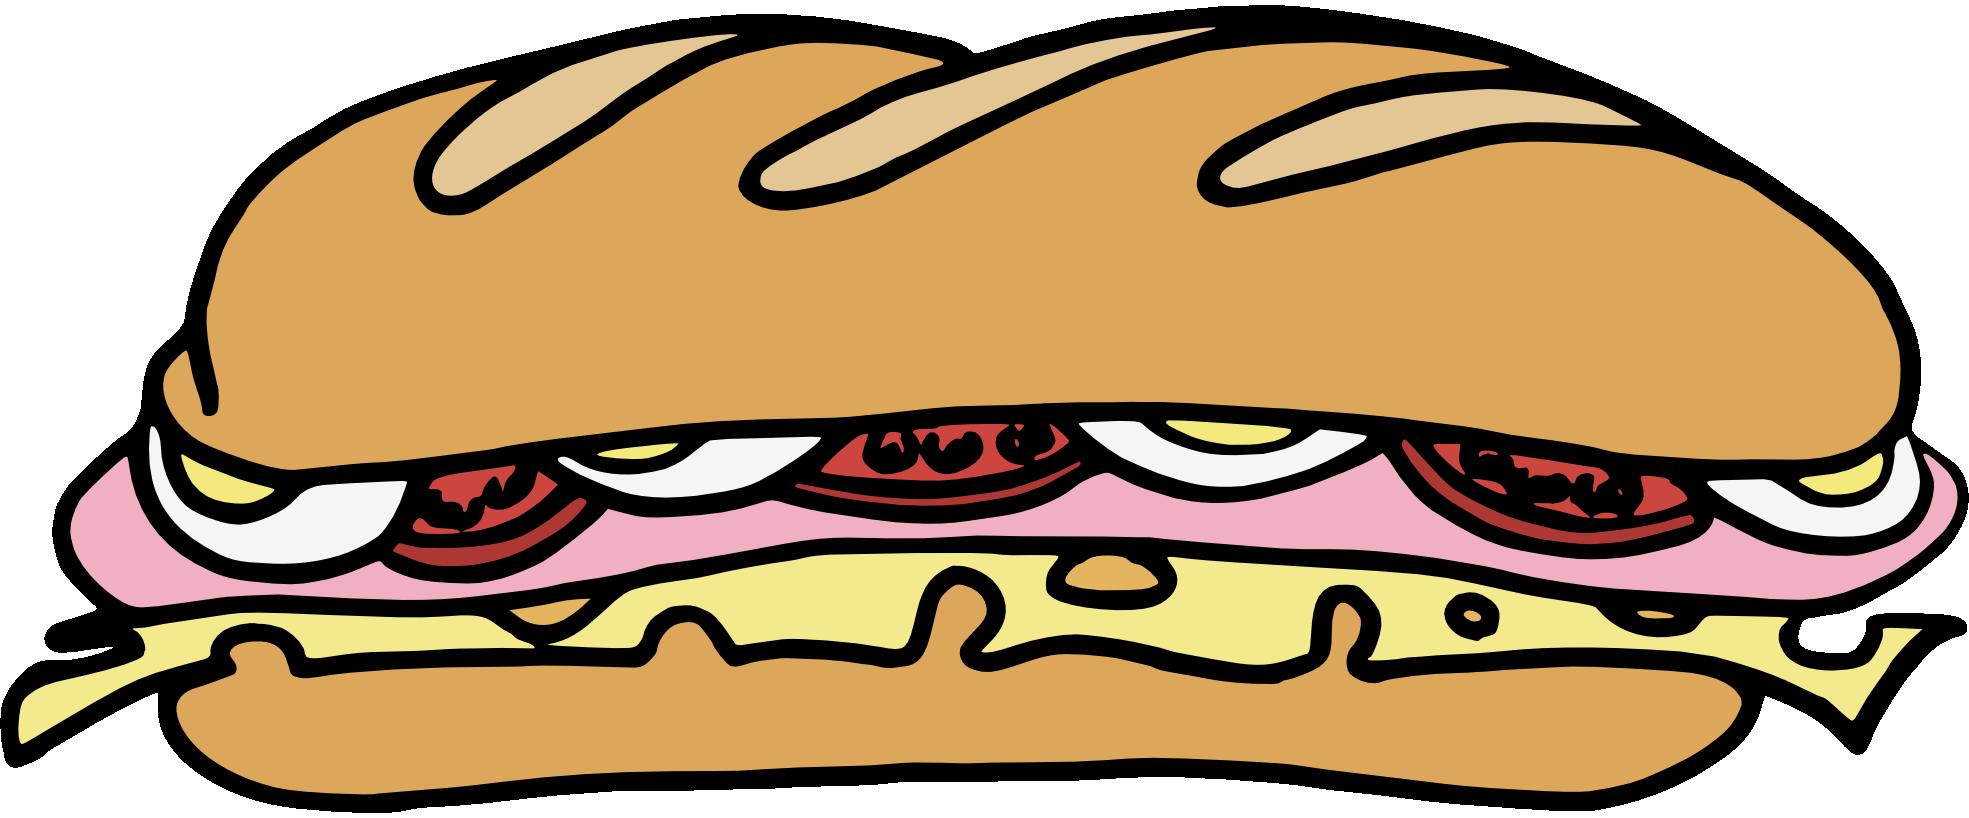 Make clipart sandwich. Panda free images subclipart